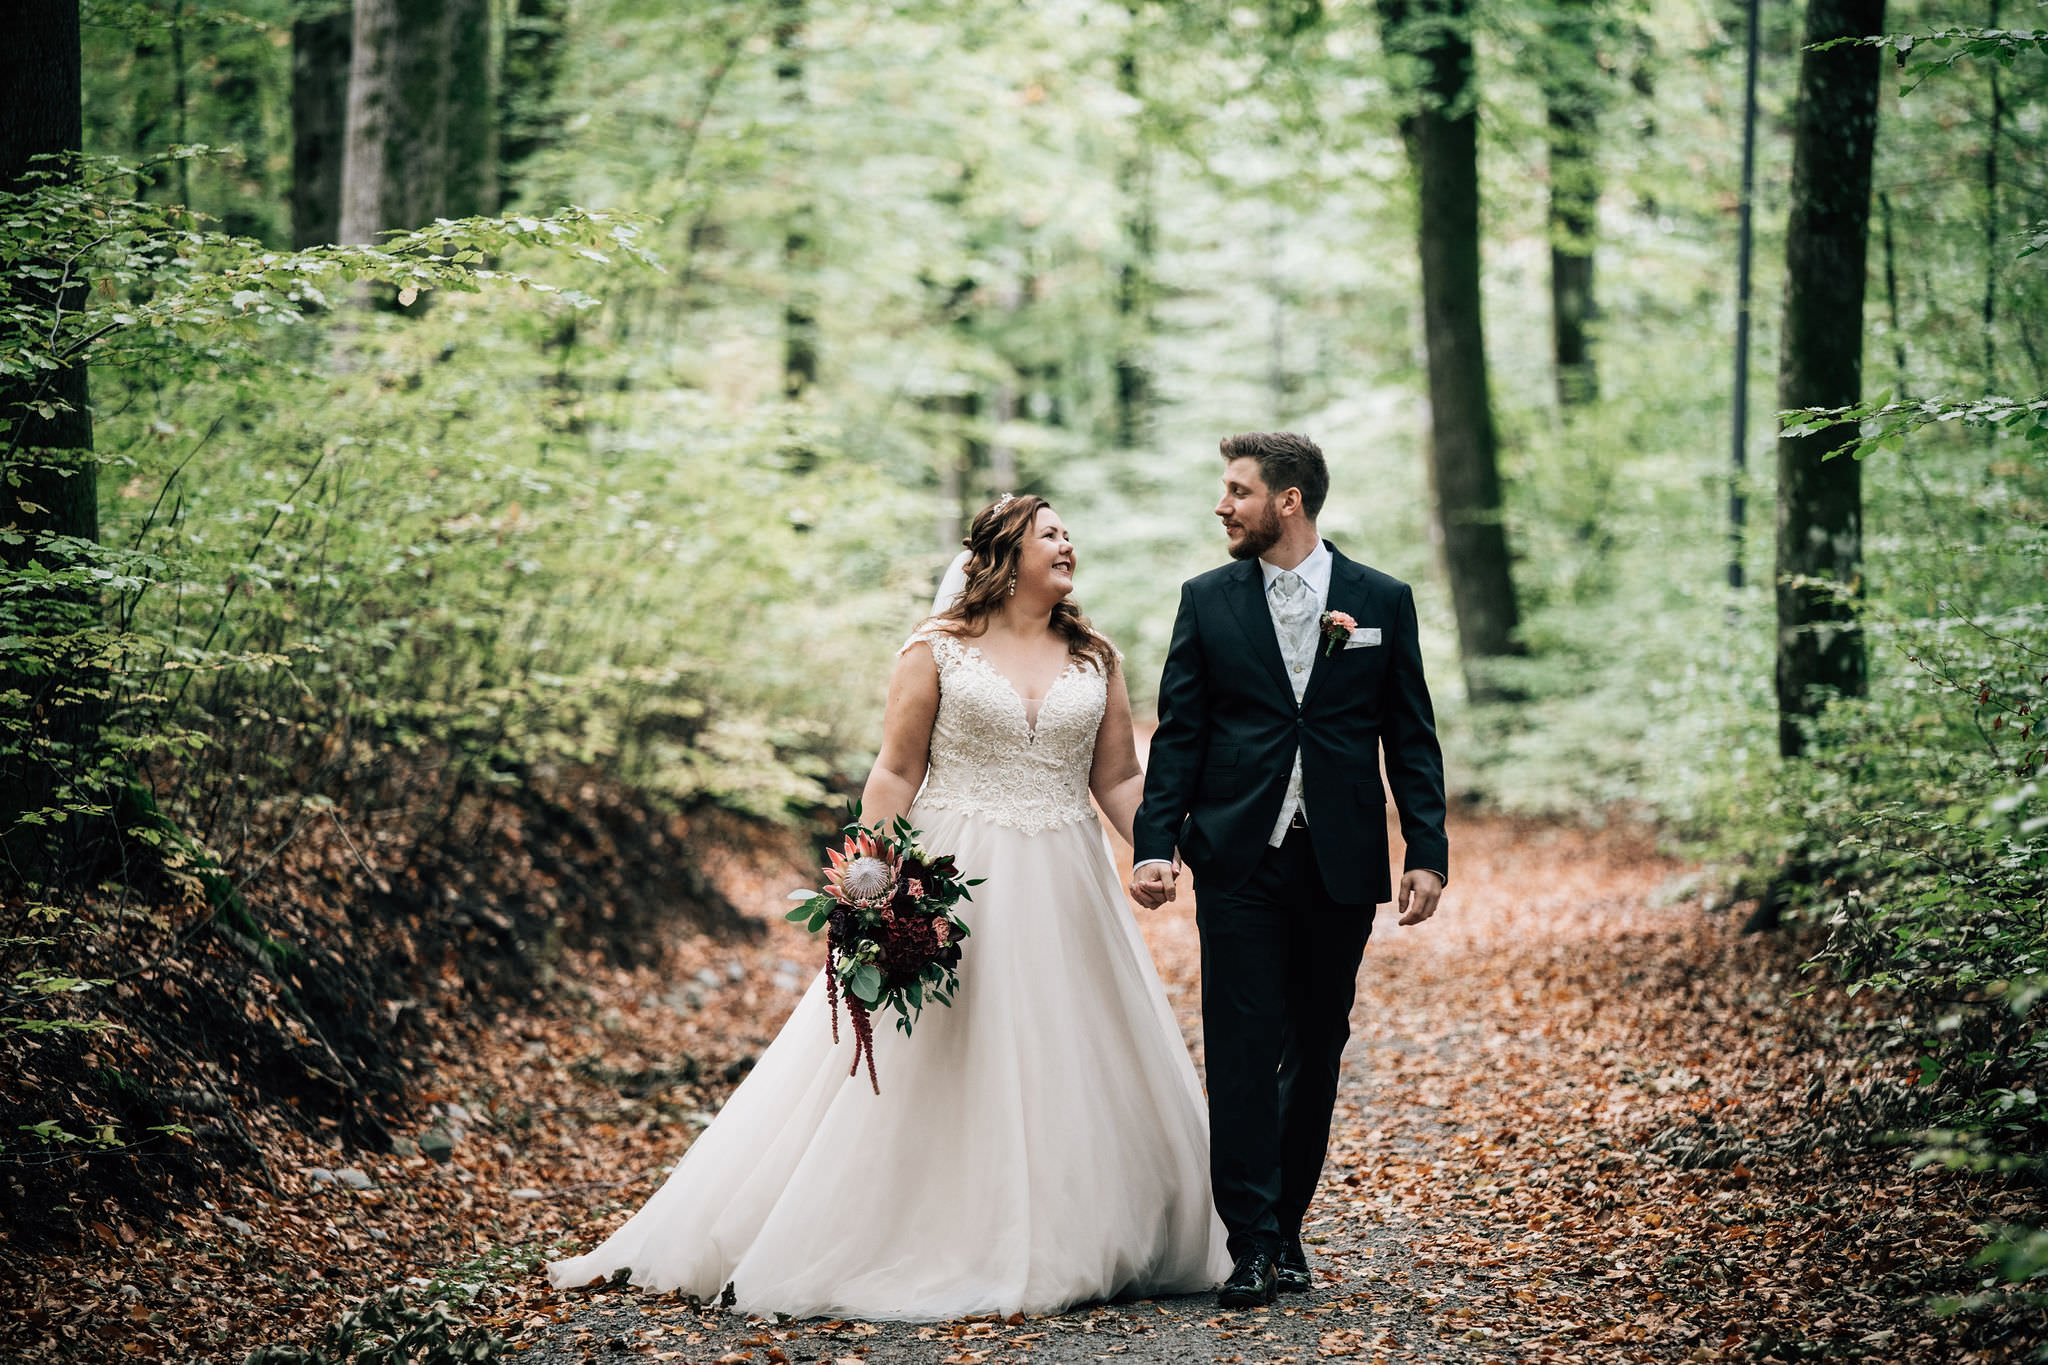 _N857859_fotografering_larvik_bryllup_aspargesgarden_.jpg